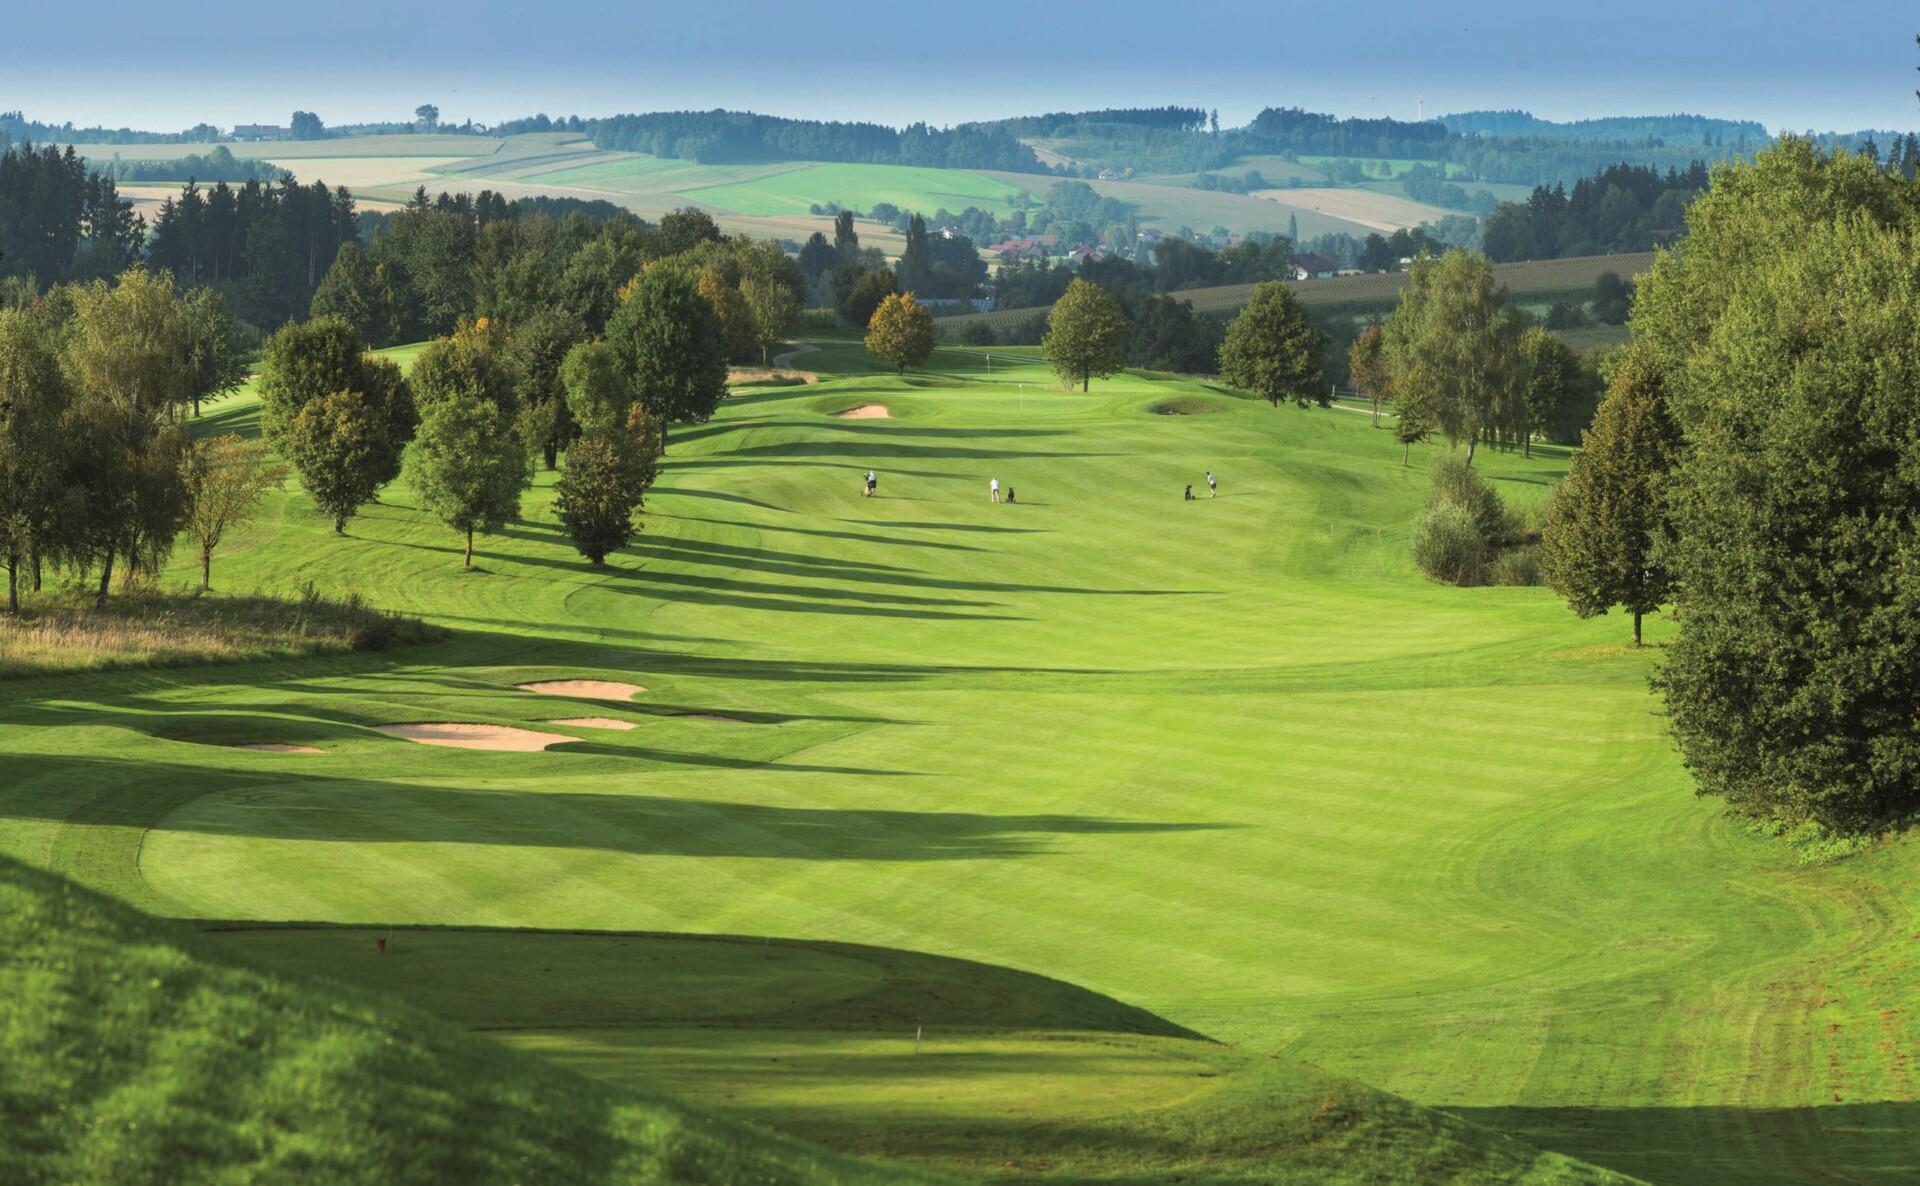 Allfinanz Golfplatz Brunnwies